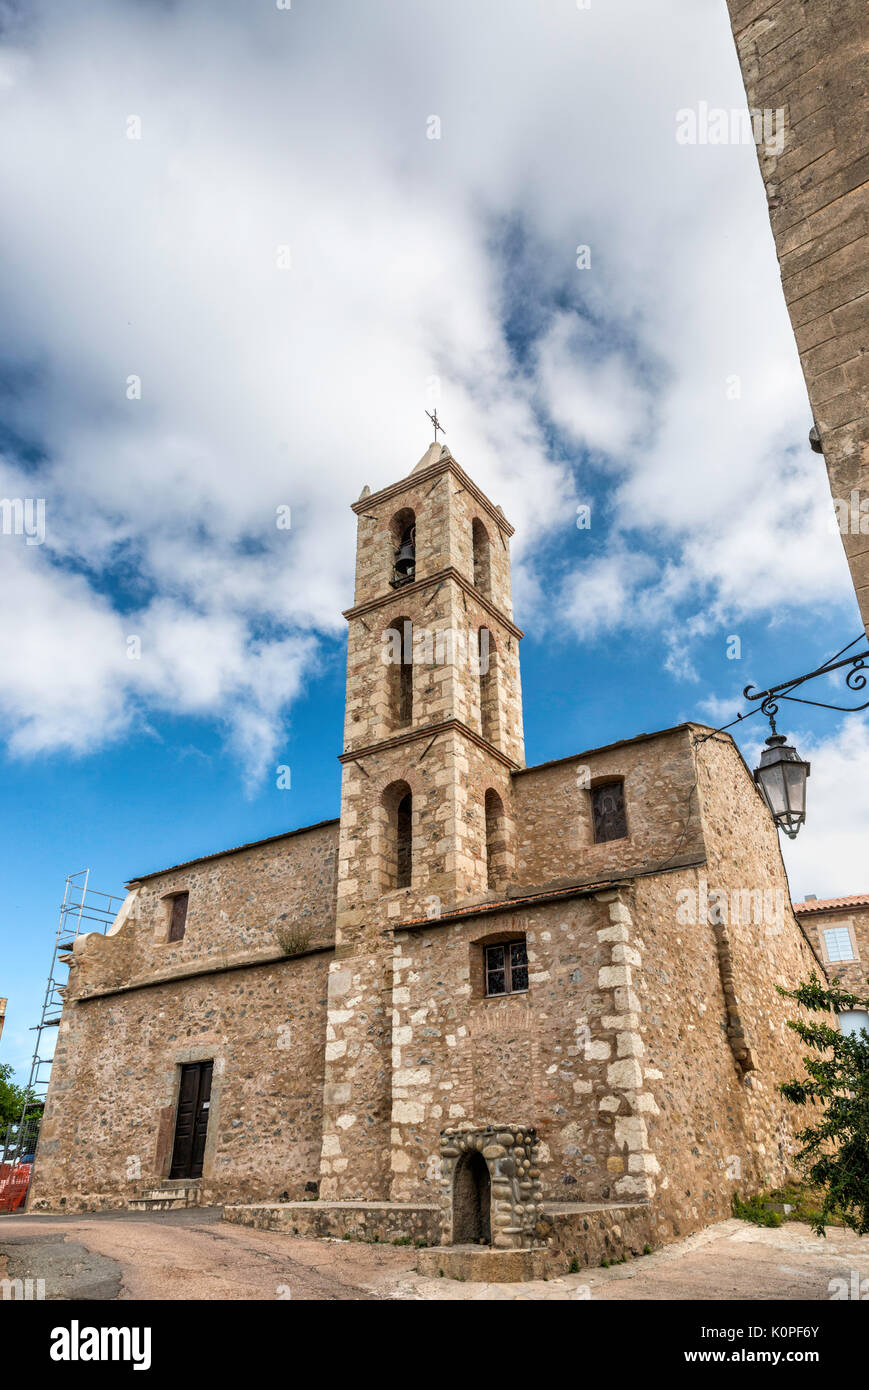 St-Marcel Church near Fort de Matra in Aleria, Corsica, France - Stock Image